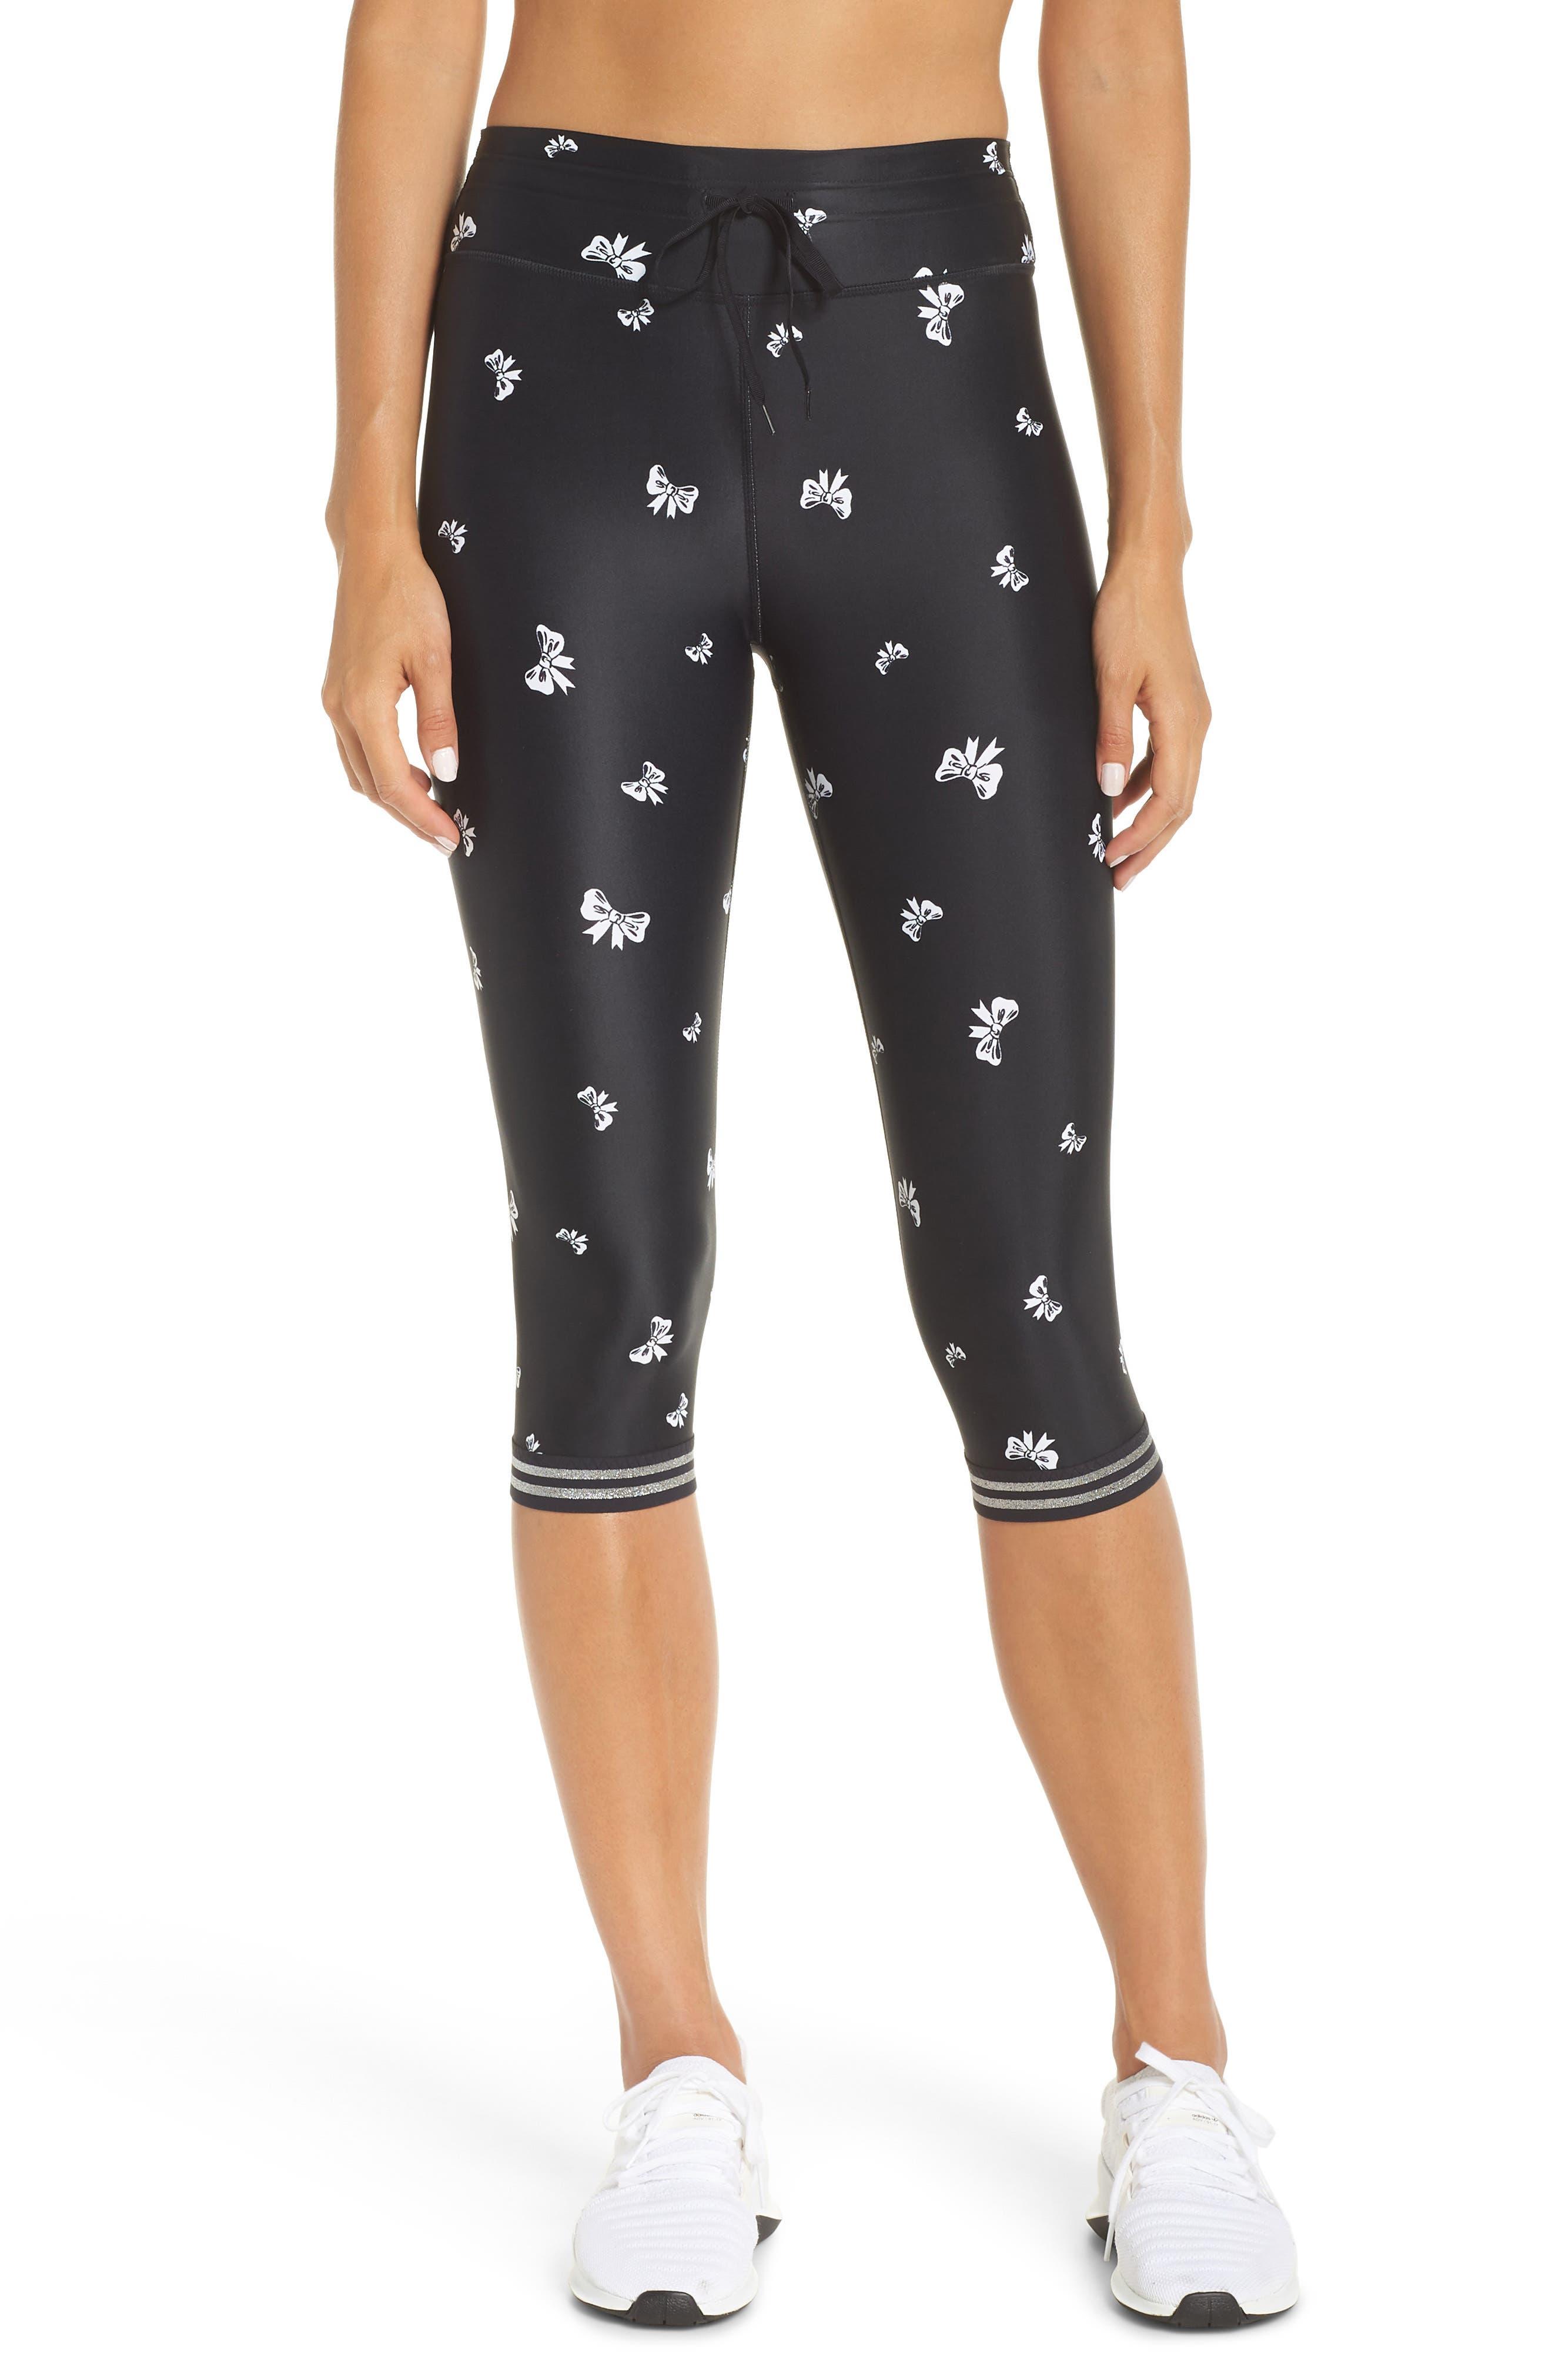 Bows Power Pant Crop Leggings,                             Main thumbnail 1, color,                             BLACK/ WHITE